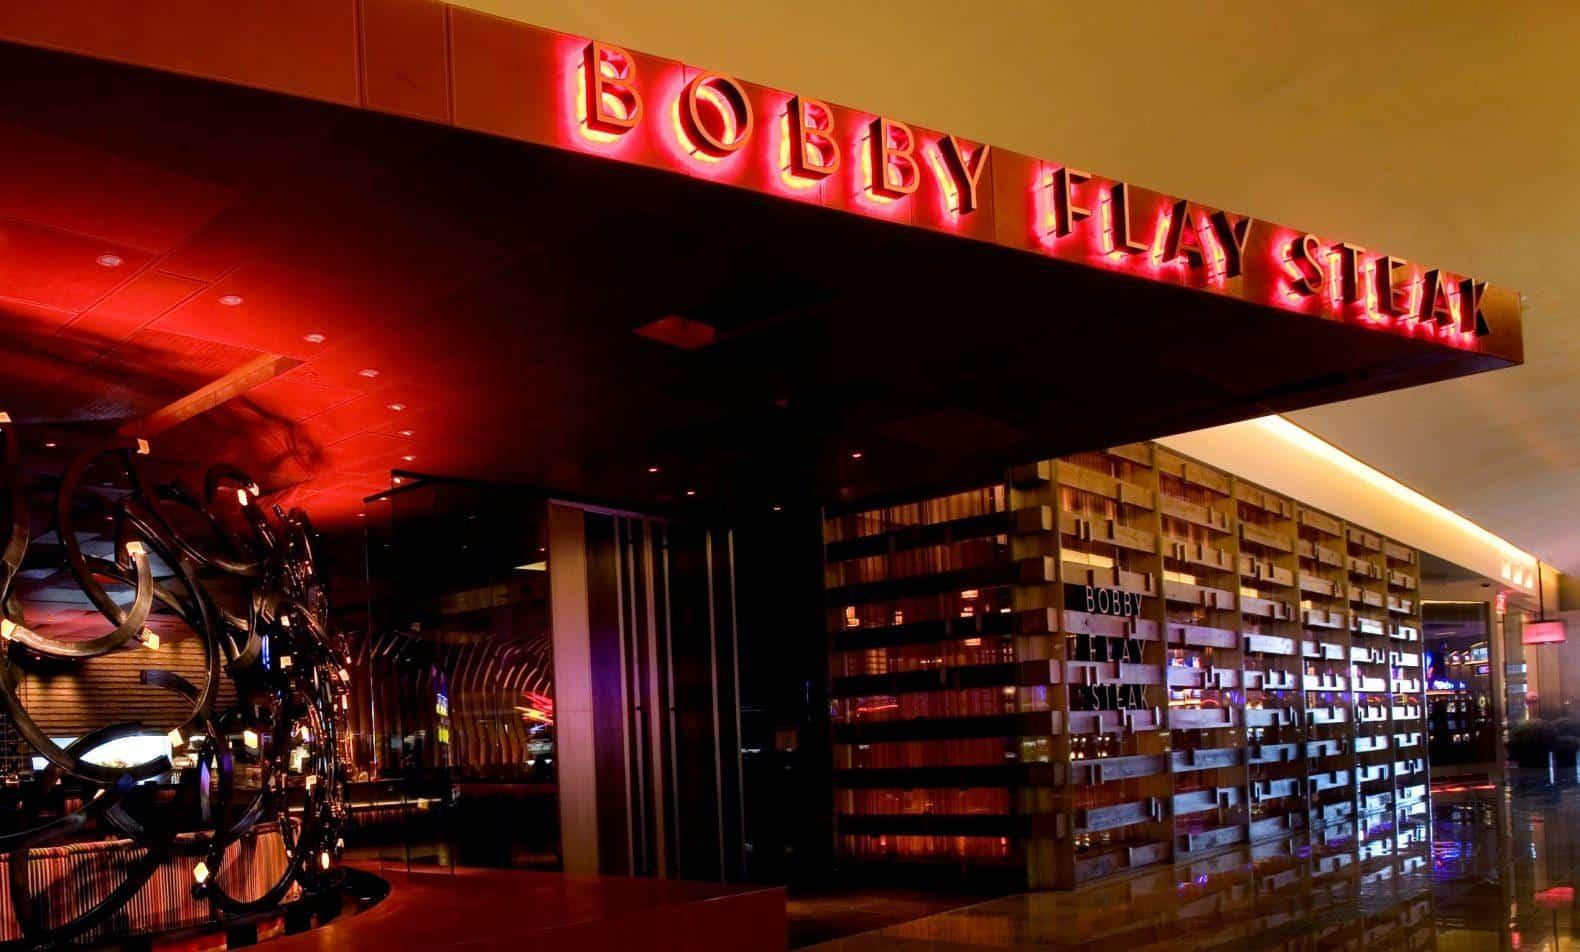 BOBBY FLAY STEAK